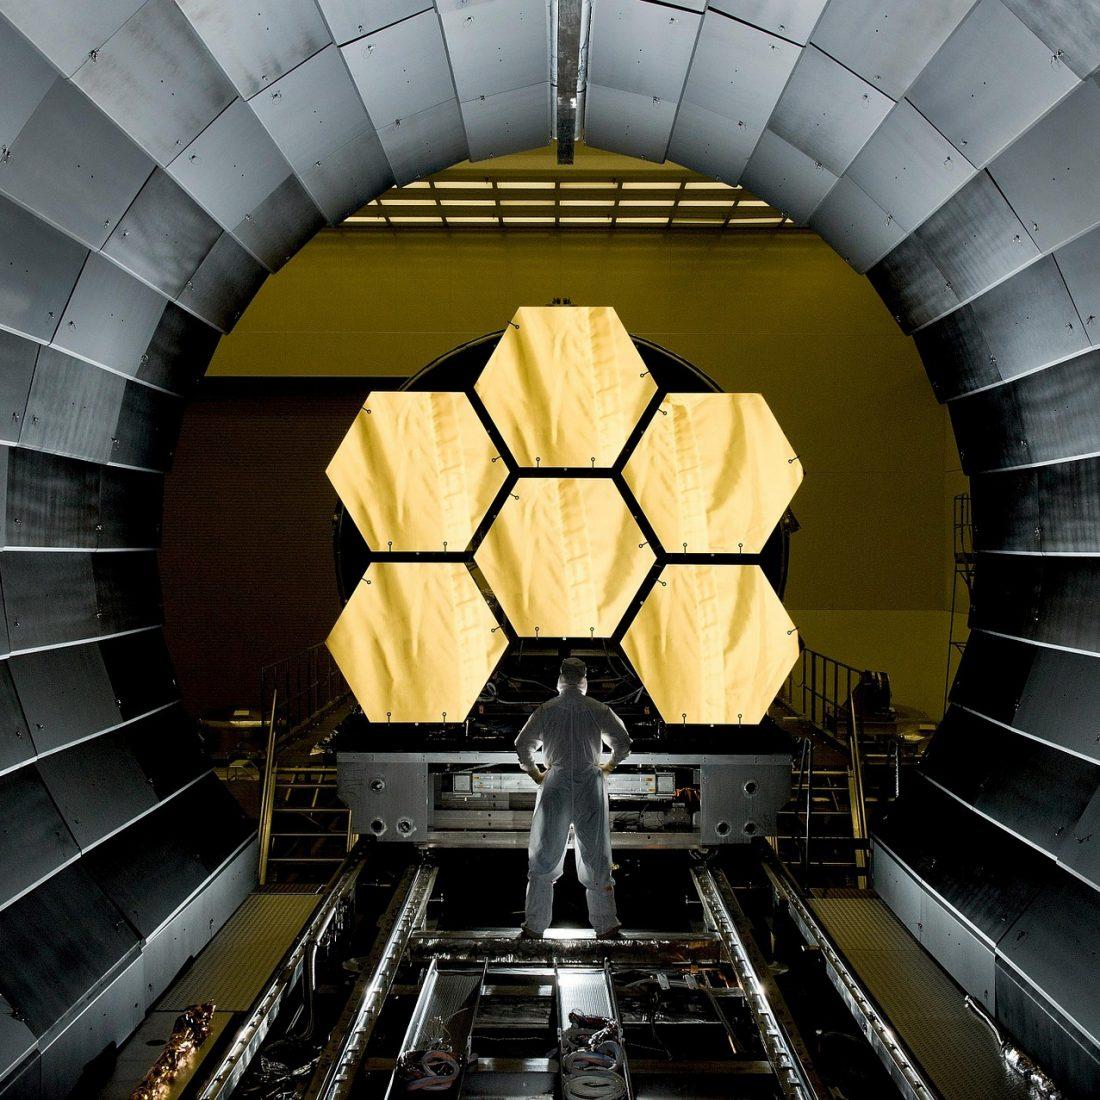 space-telescope-532989_1920 (1)